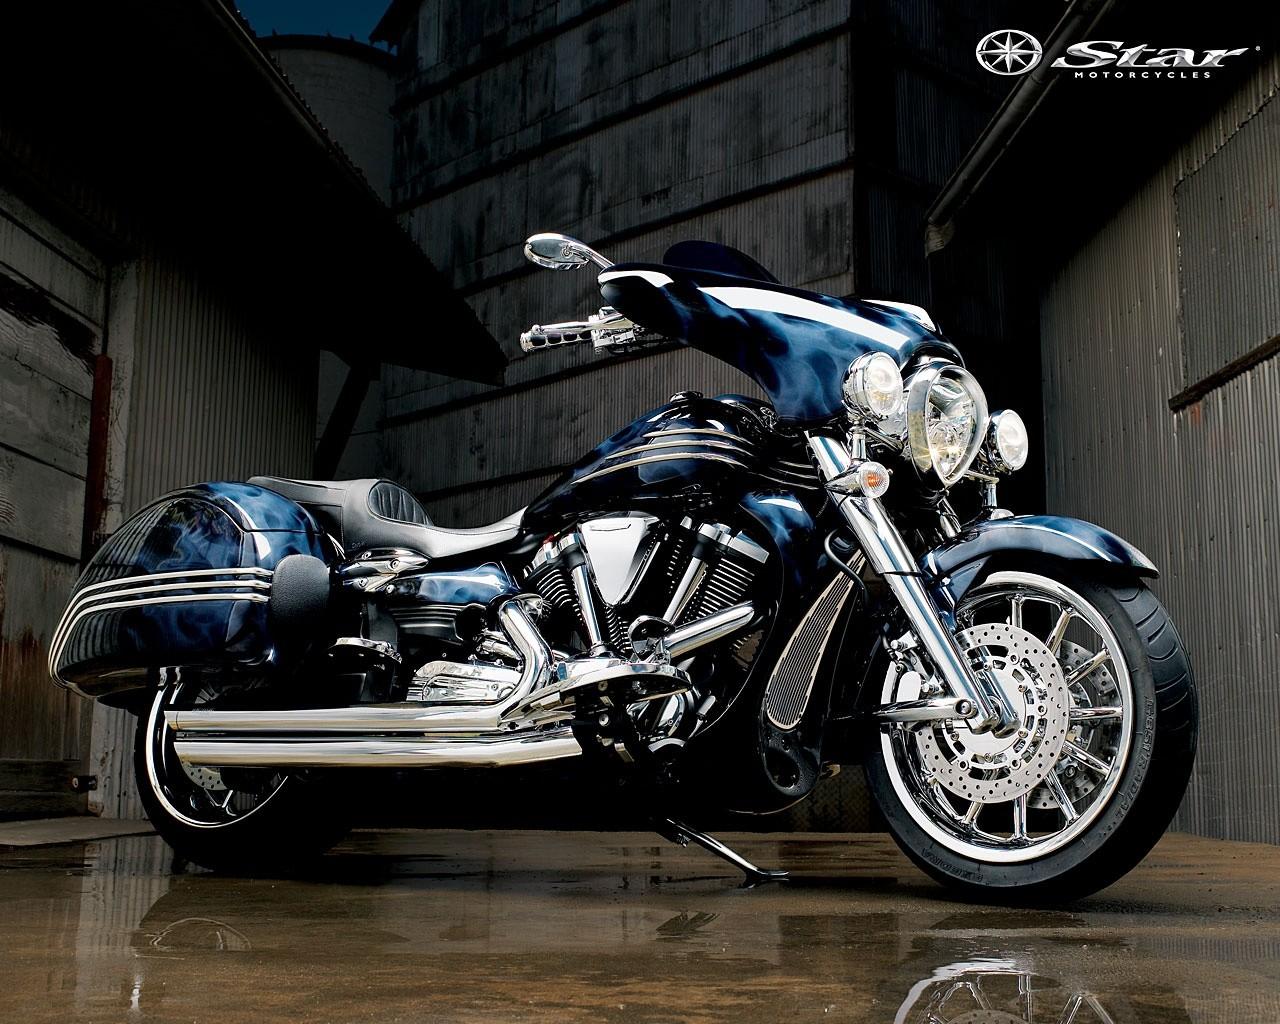 motorcycle wallpaper Vamaha Motorcycle Wallpaper 1280x1024